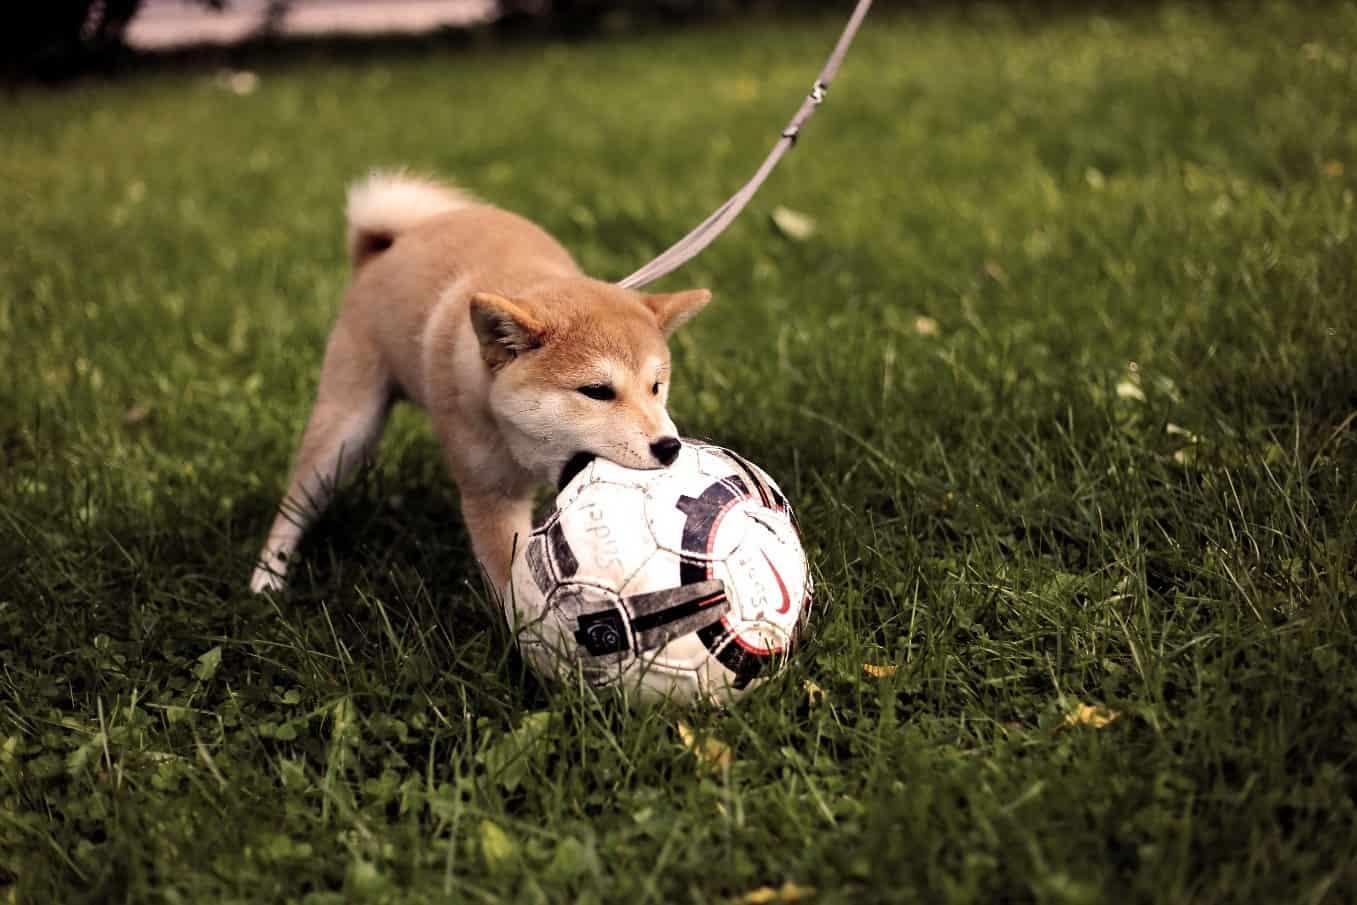 Shiba playing soccer